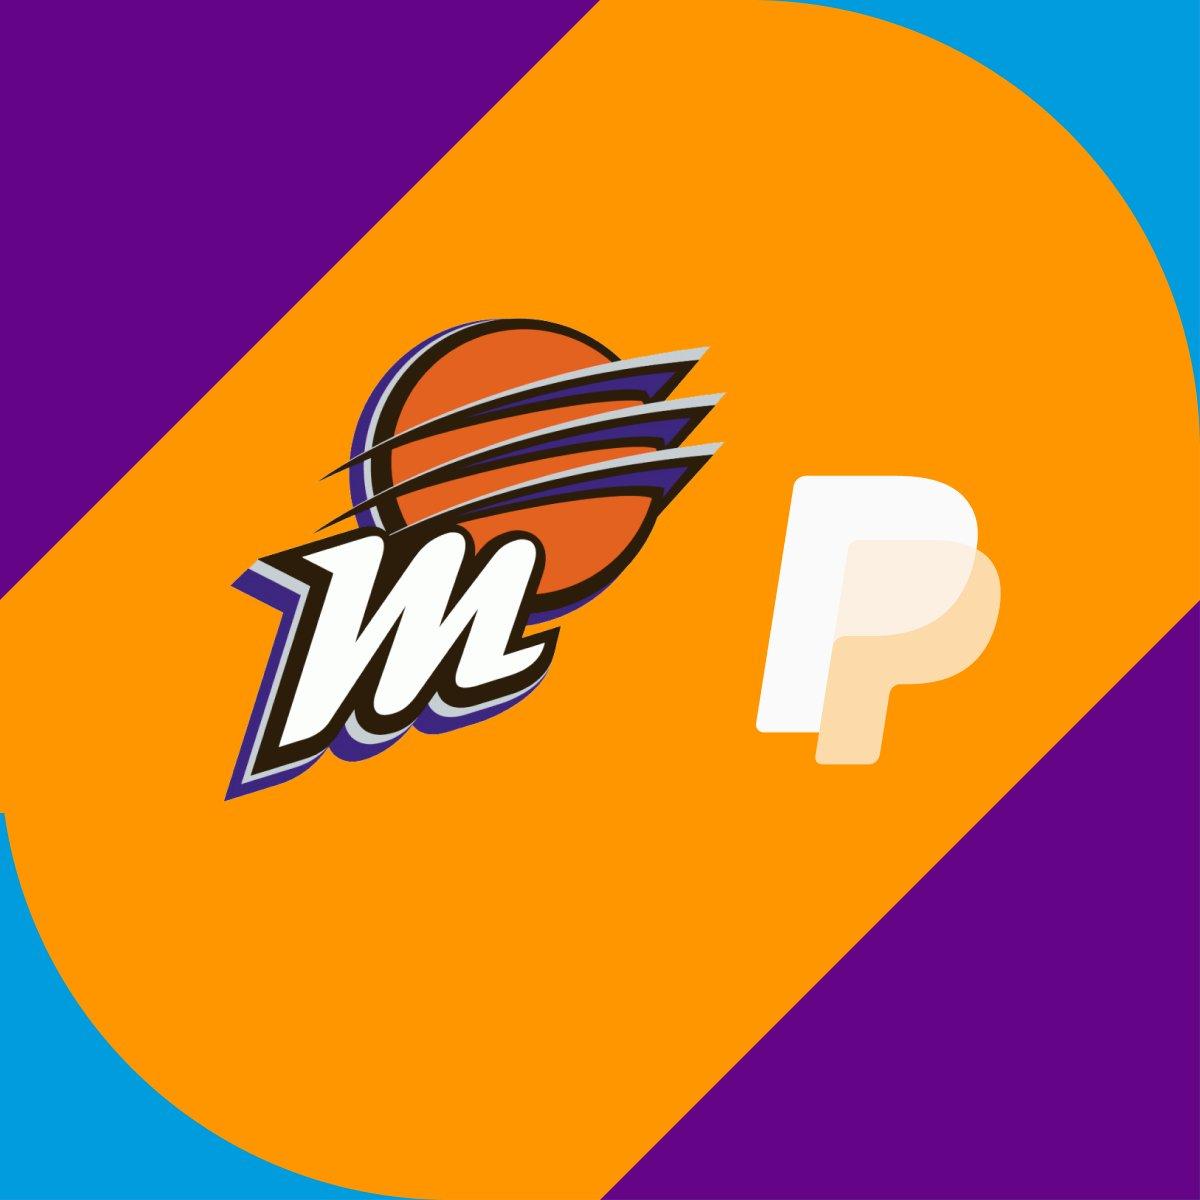 PayPal photo